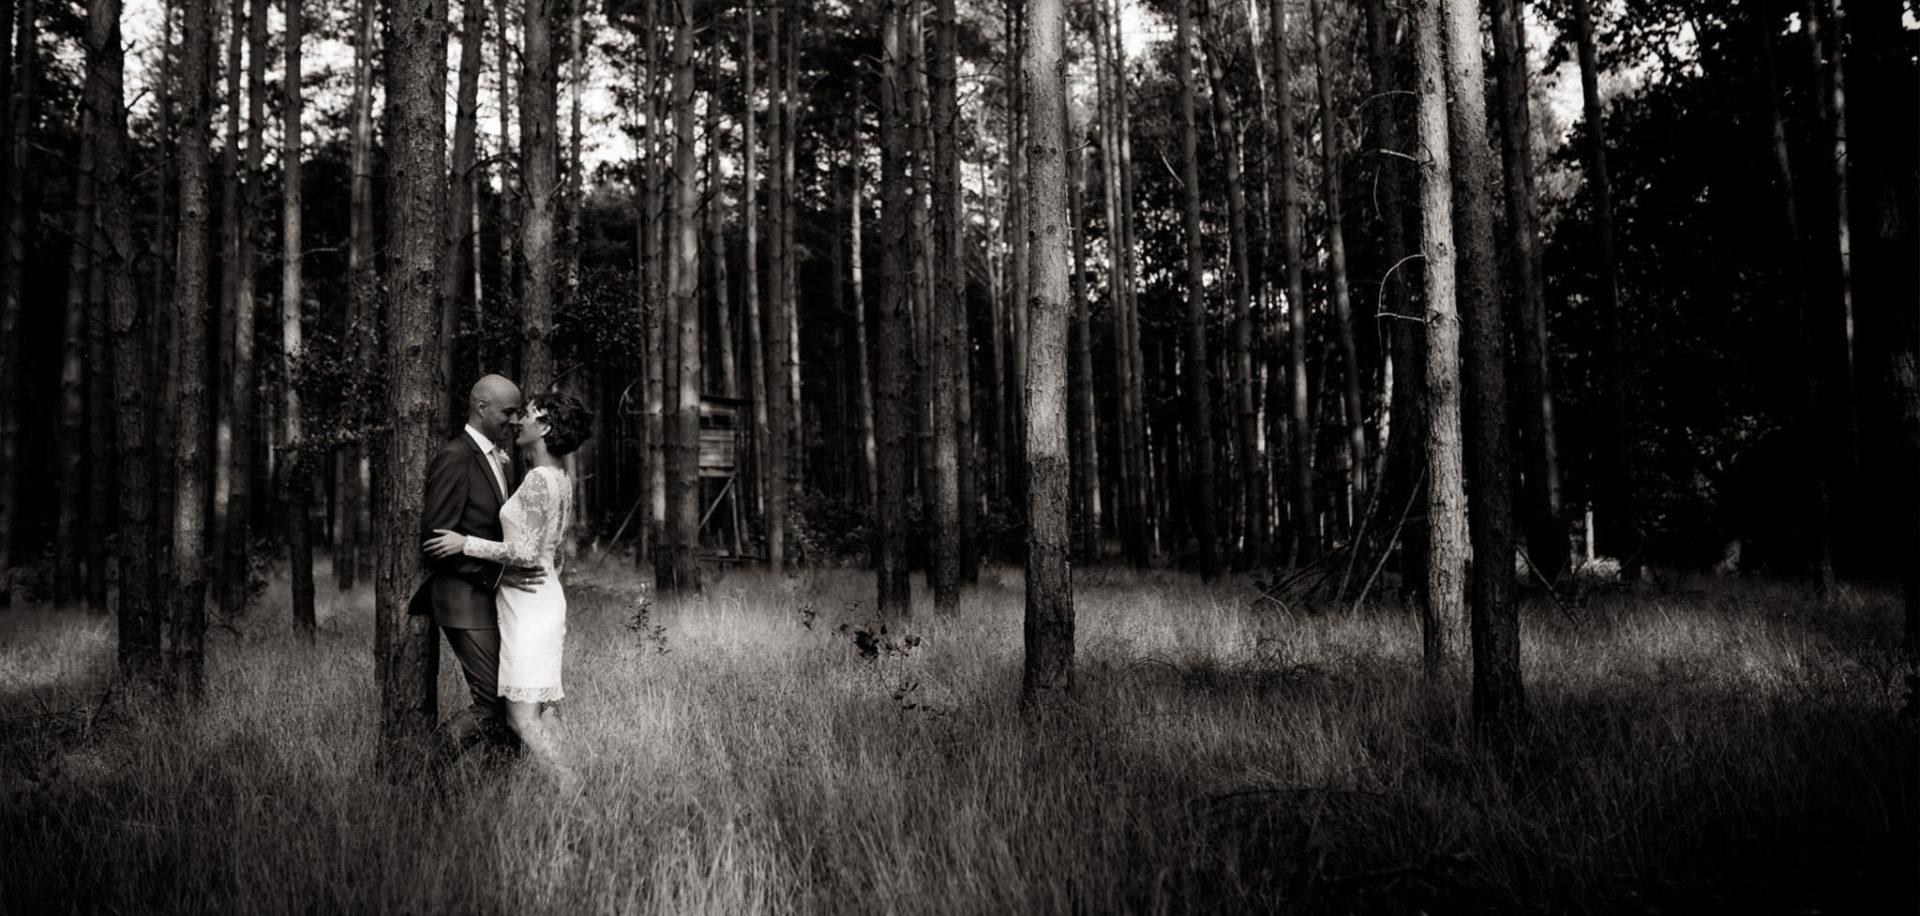 hochzeitsfilm-fusion wedding video-fusionvideo-hochzeitsvideo-videograf Hochzeit-fotograf und videograf team